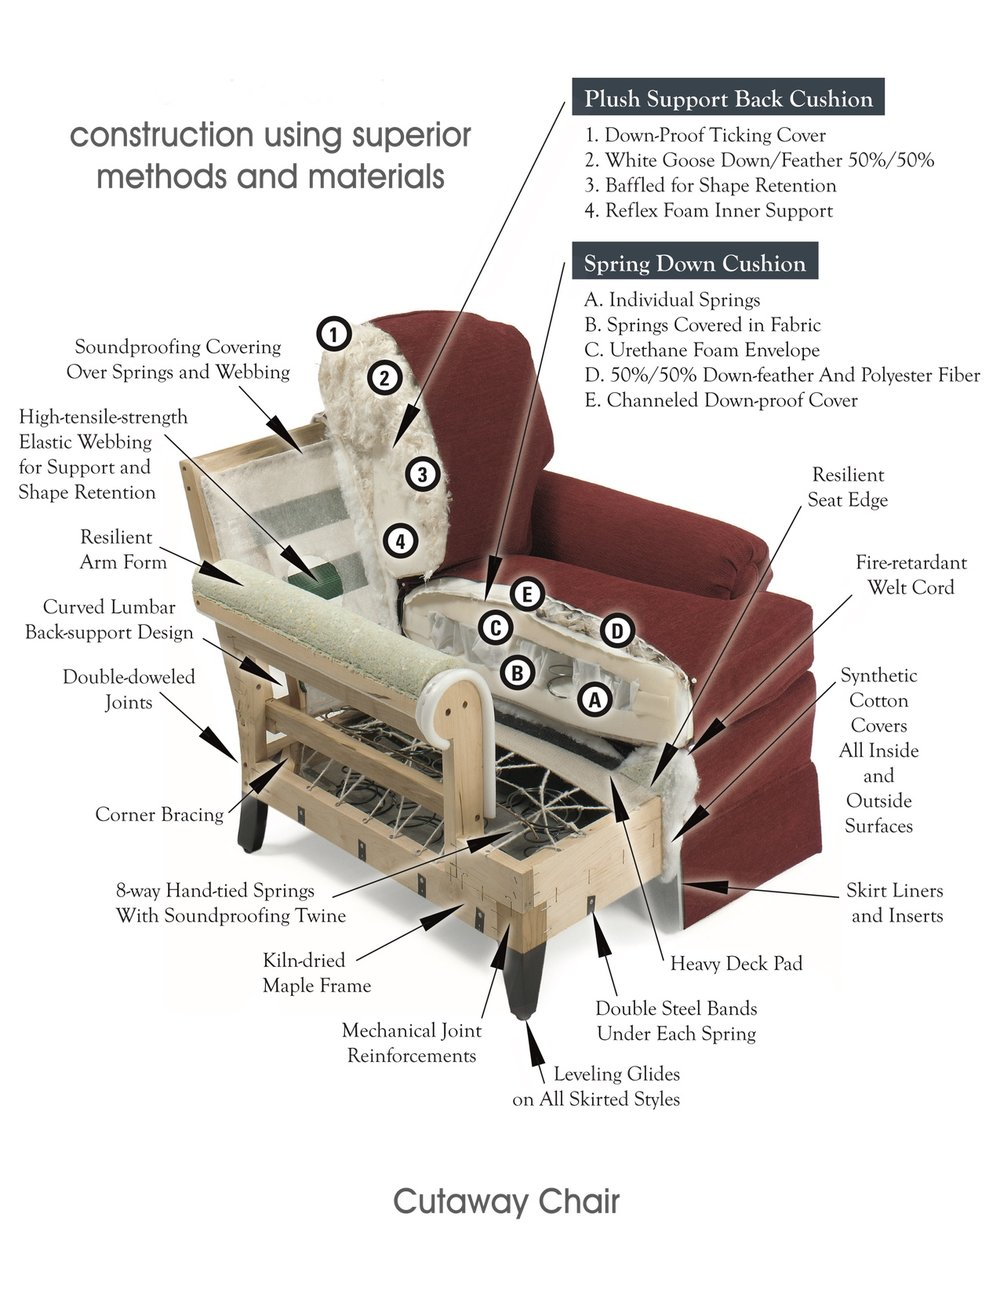 cutaway-chair-construction.jpg